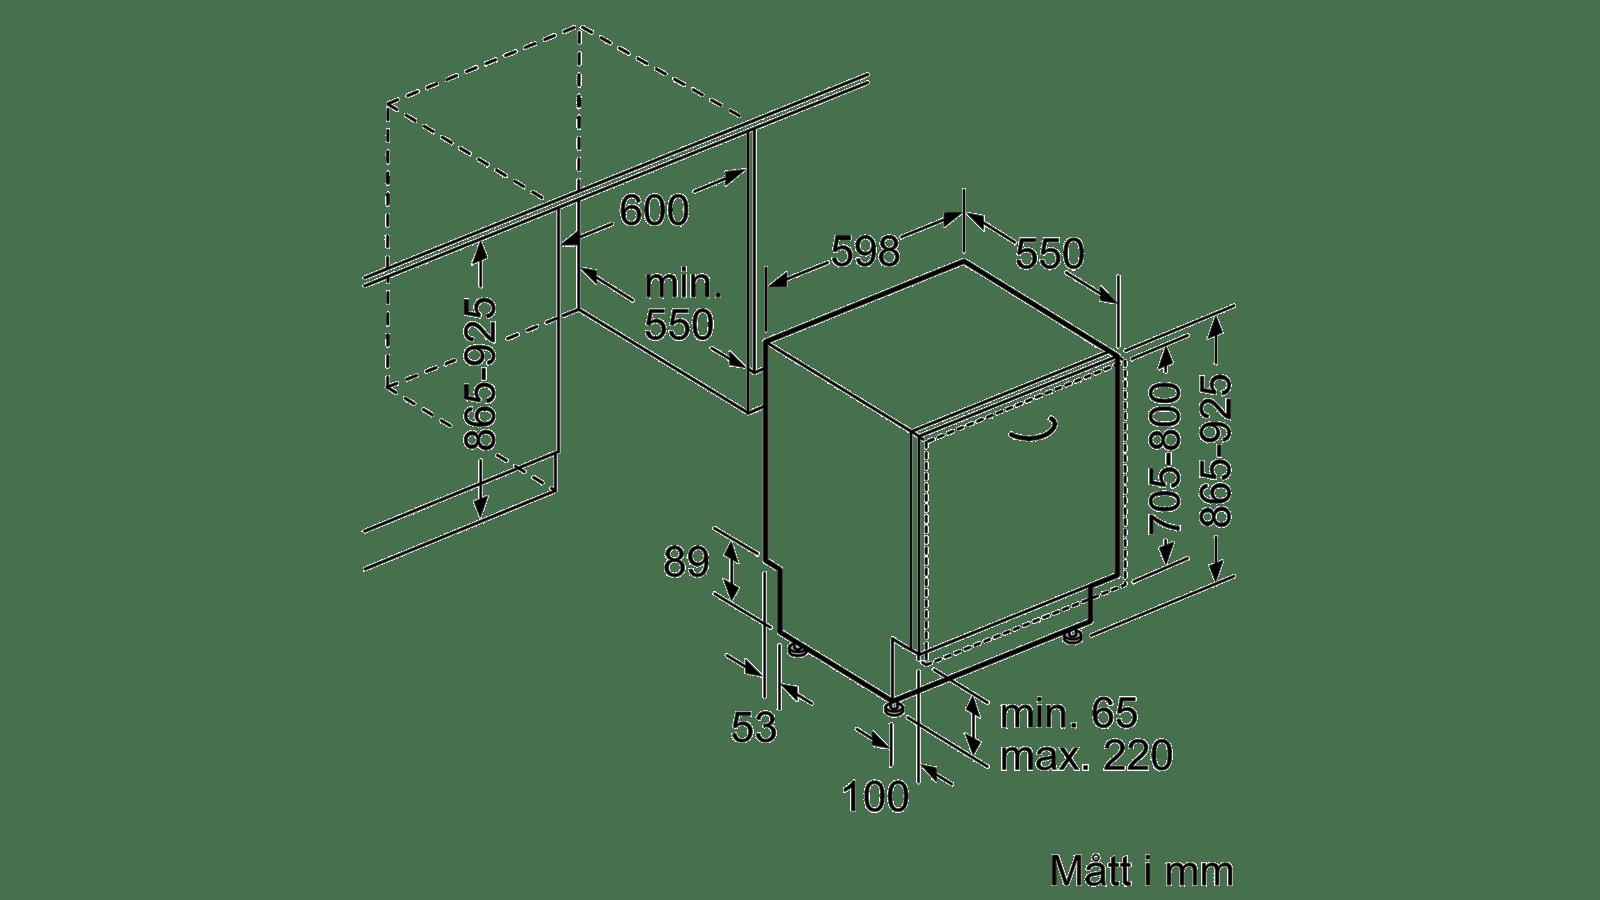 Köp Bosch Integrerad Diskmaskin SBE45CX00E FrÃ¥n 9 199 kr : toalettstol mått : Inredning